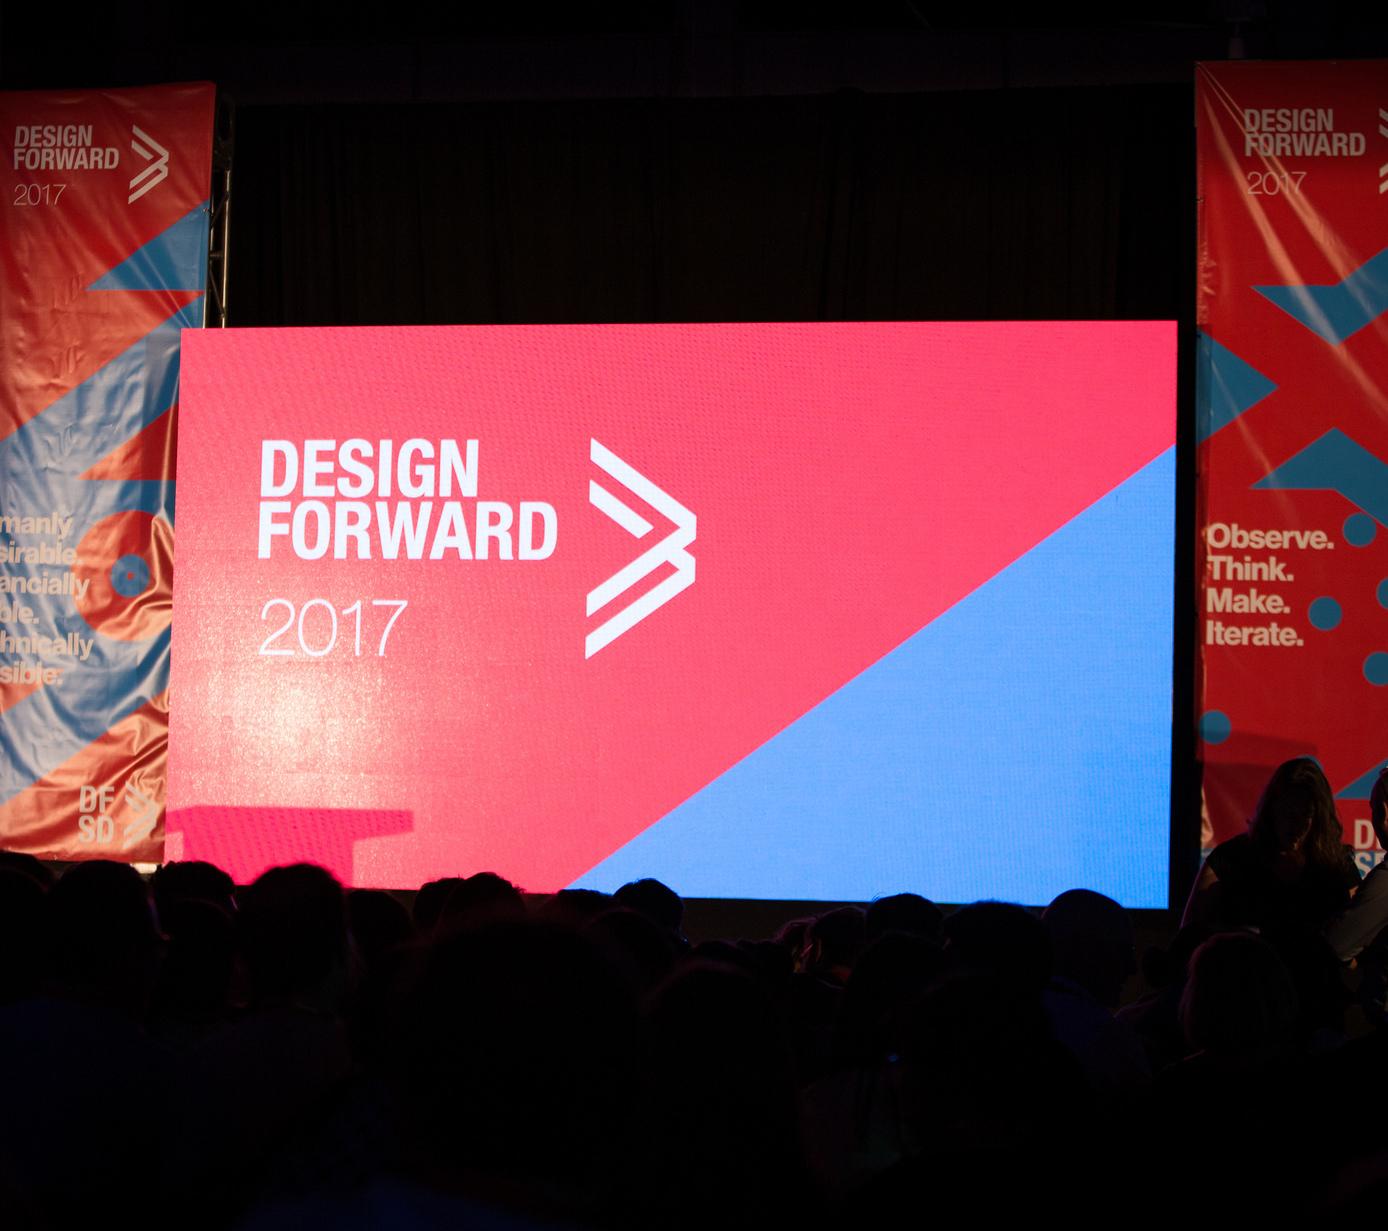 design lab michele morris design forward summit xconomy uc san diego